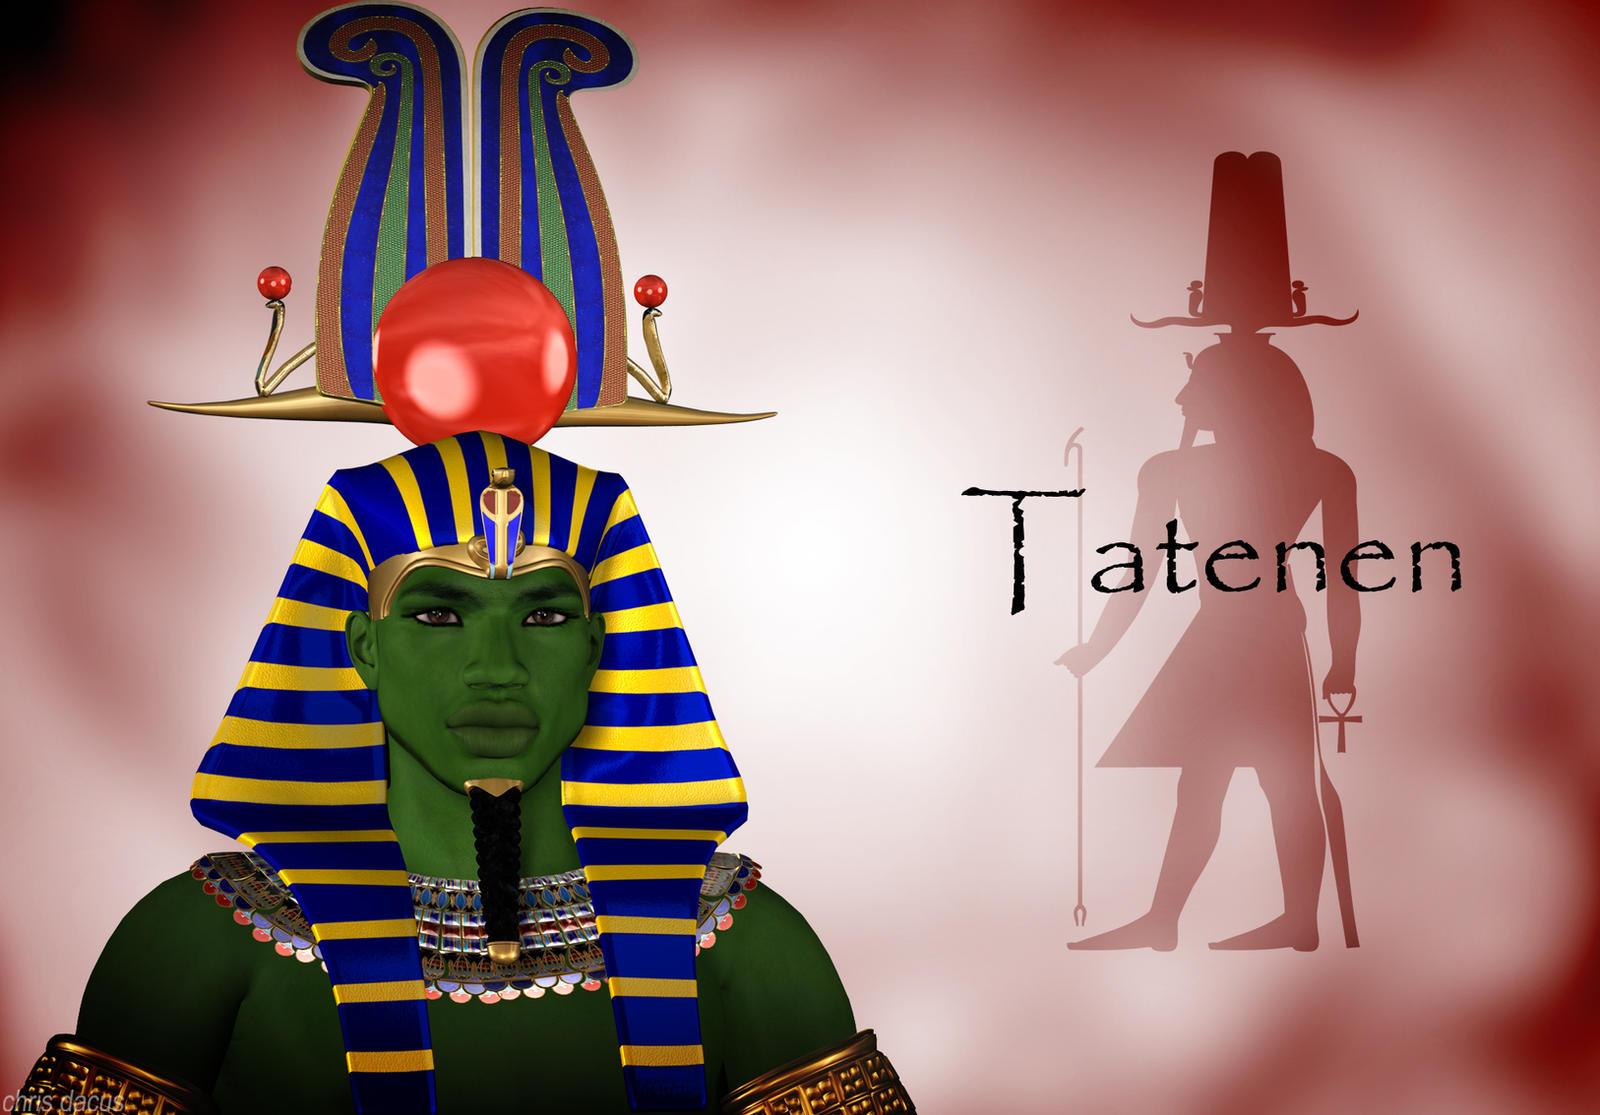 tatenen by yangzeninja on deviantart